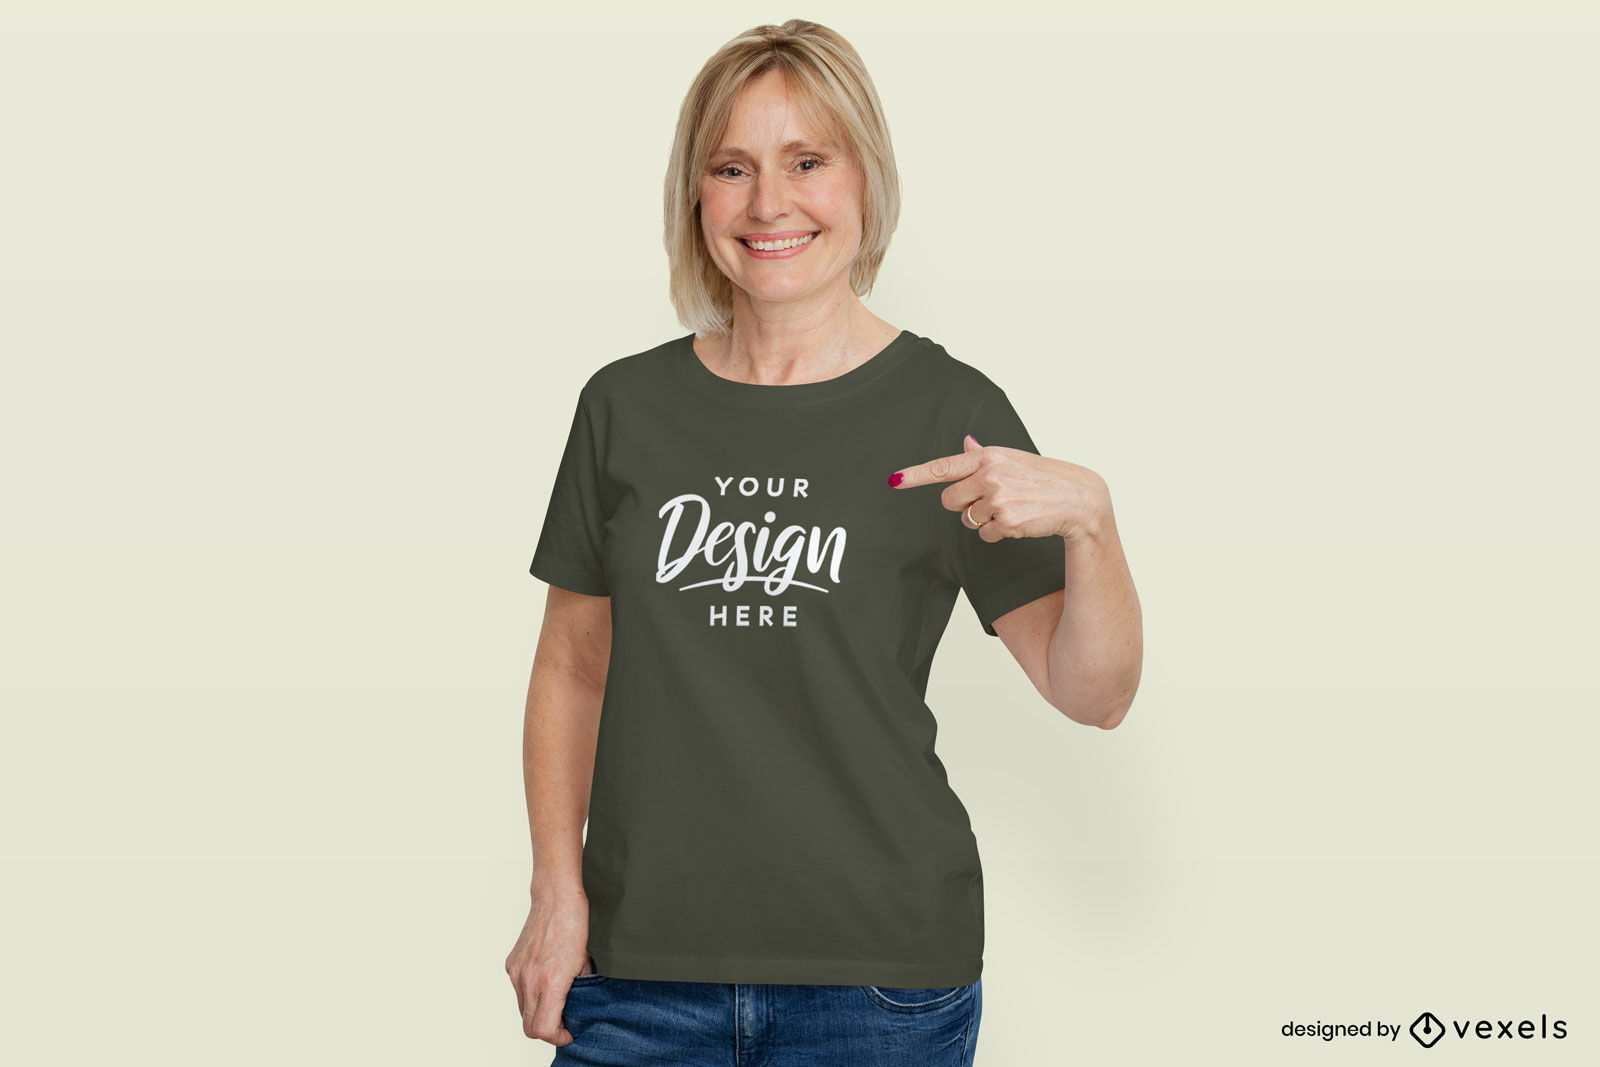 Mujer en maqueta de fondo plano de camiseta verde oscuro